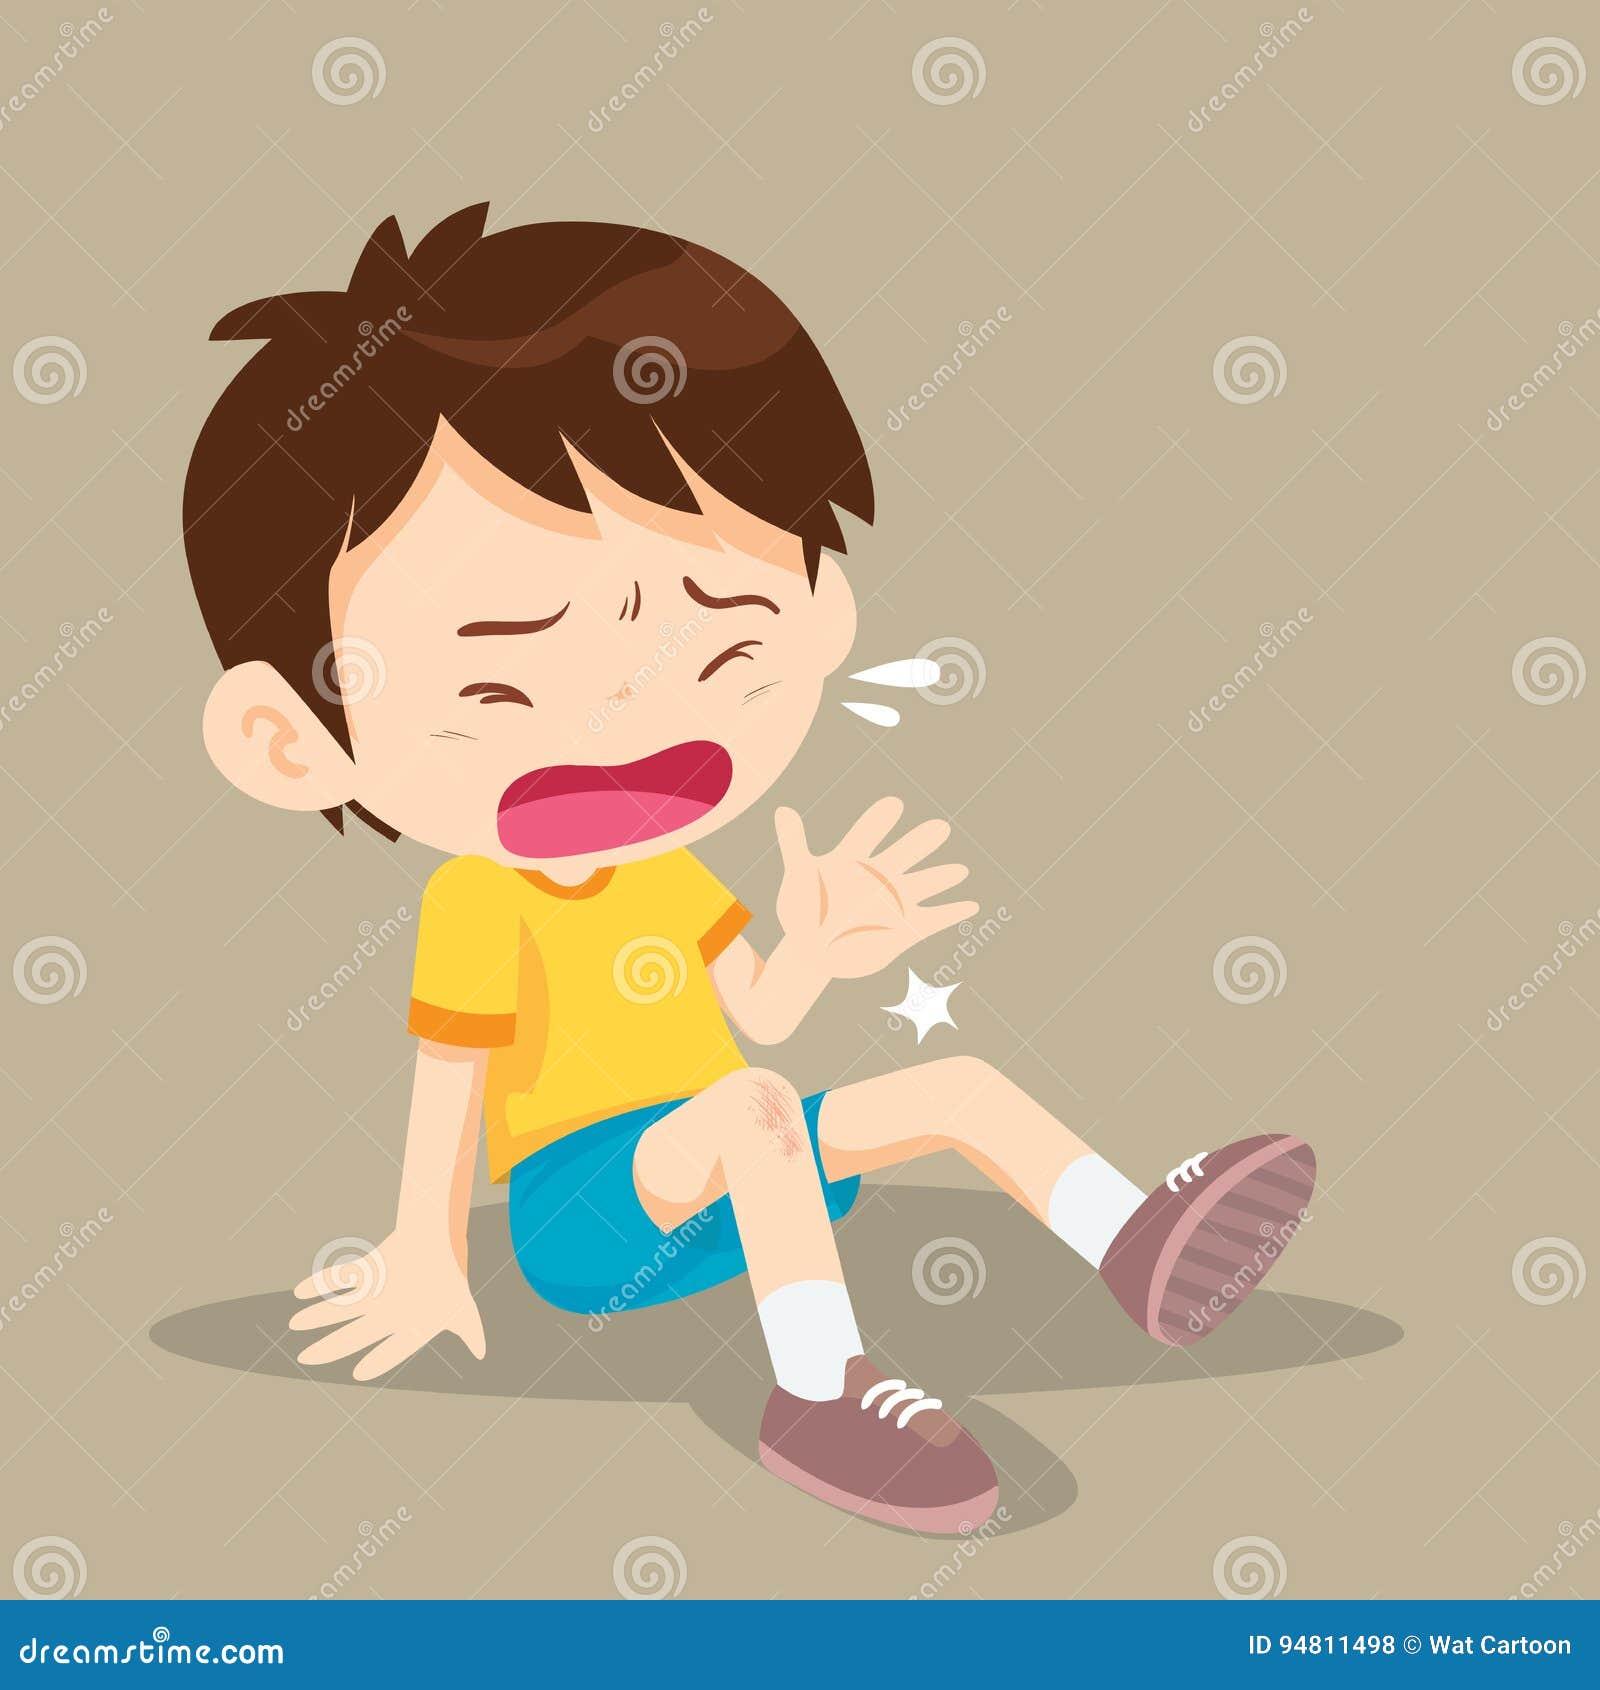 Boy having bruises on his leg